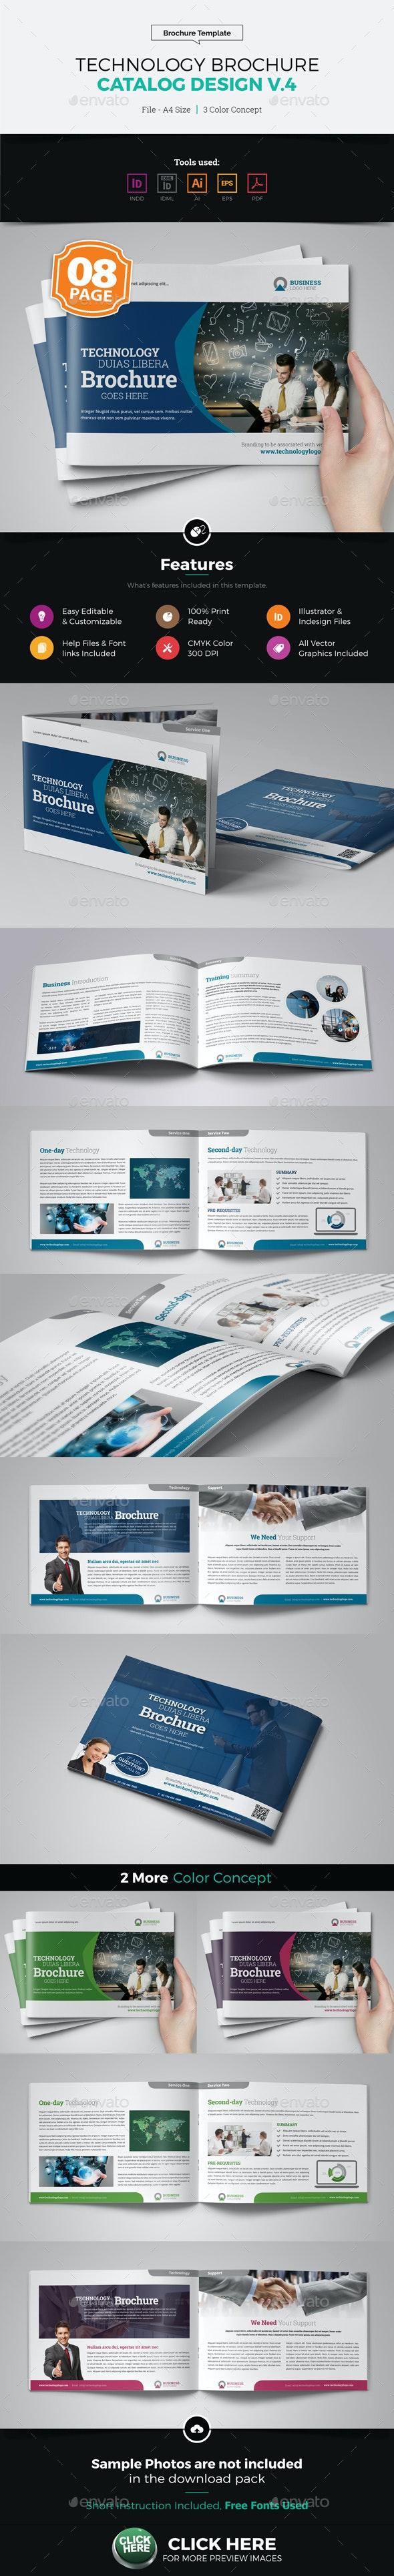 Technology Brochure Catalog Template v4 - Corporate Brochures